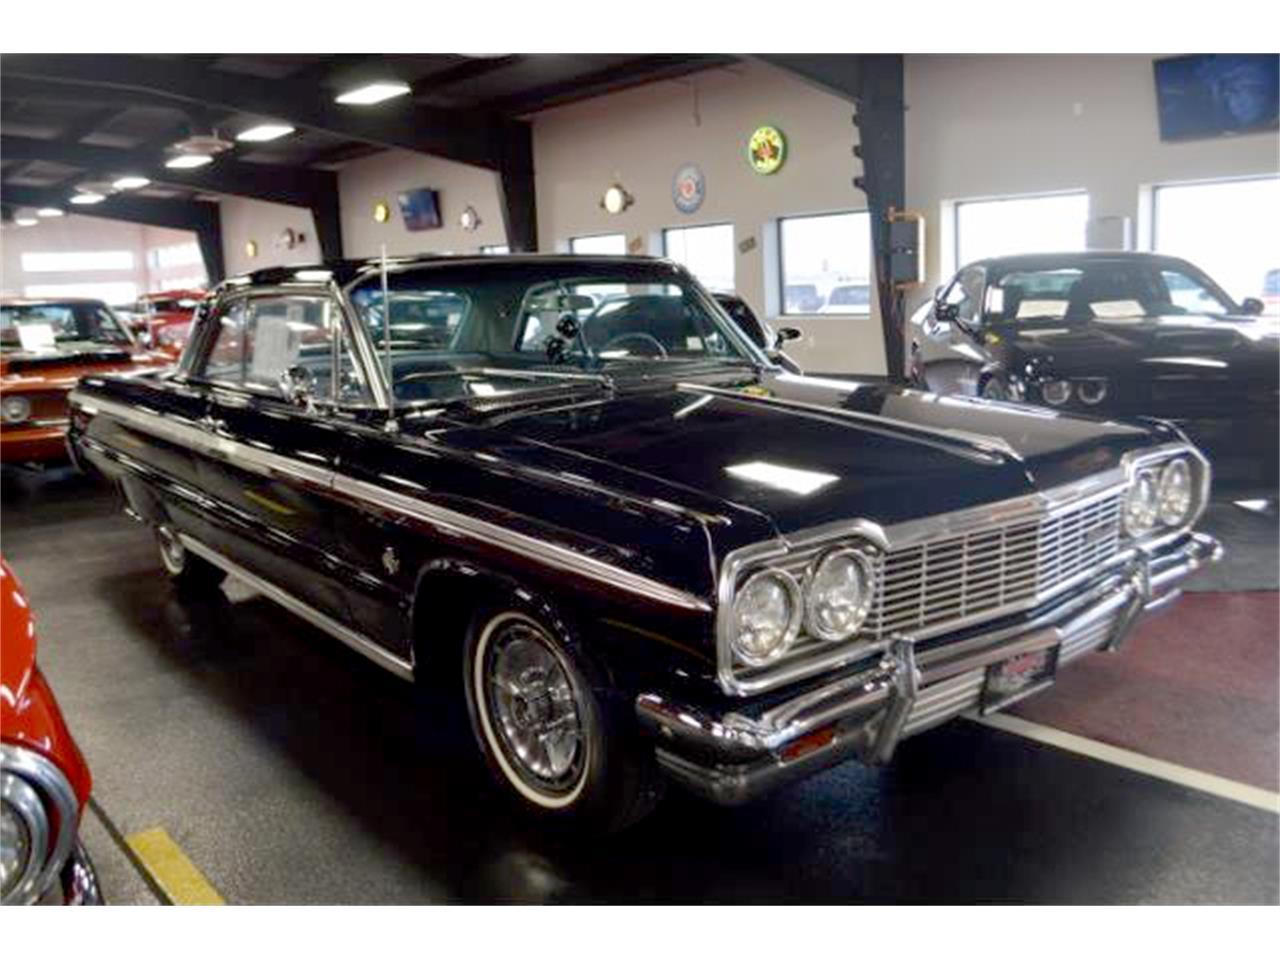 Large Picture of '64 Impala located in Scottsdale Arizona Auction Vehicle - MG5V